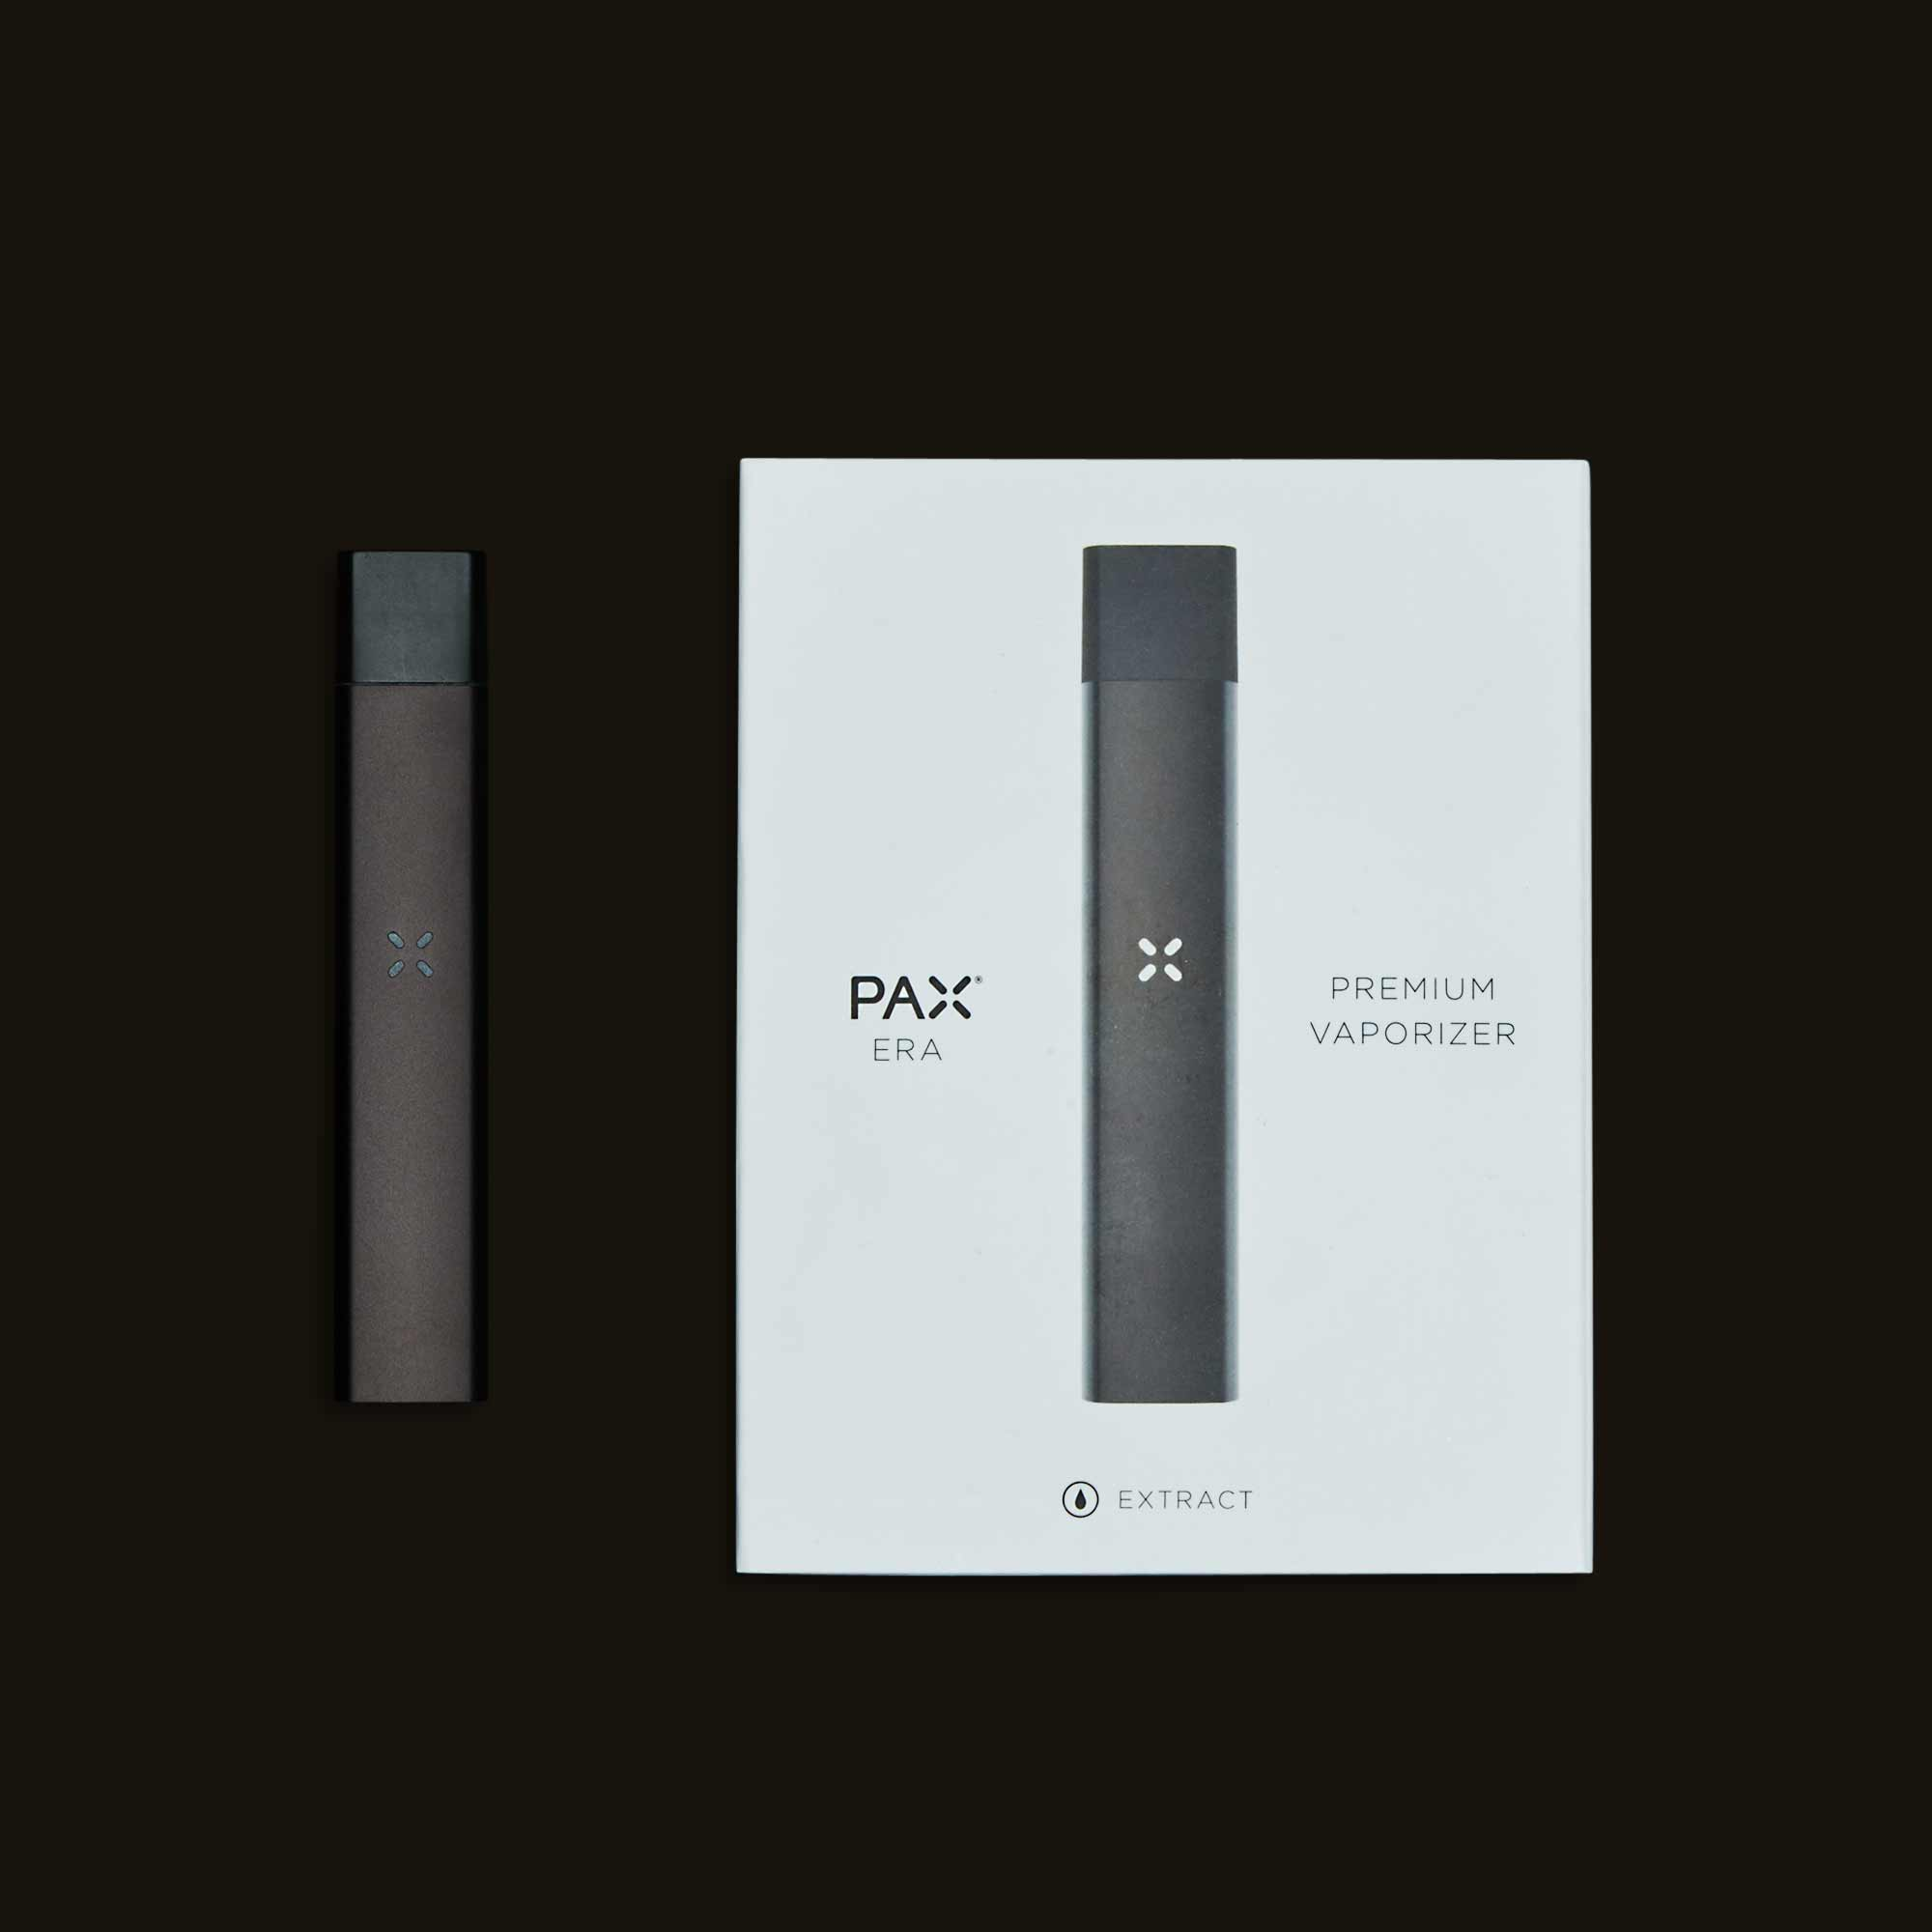 PAX ERA batter in packaging